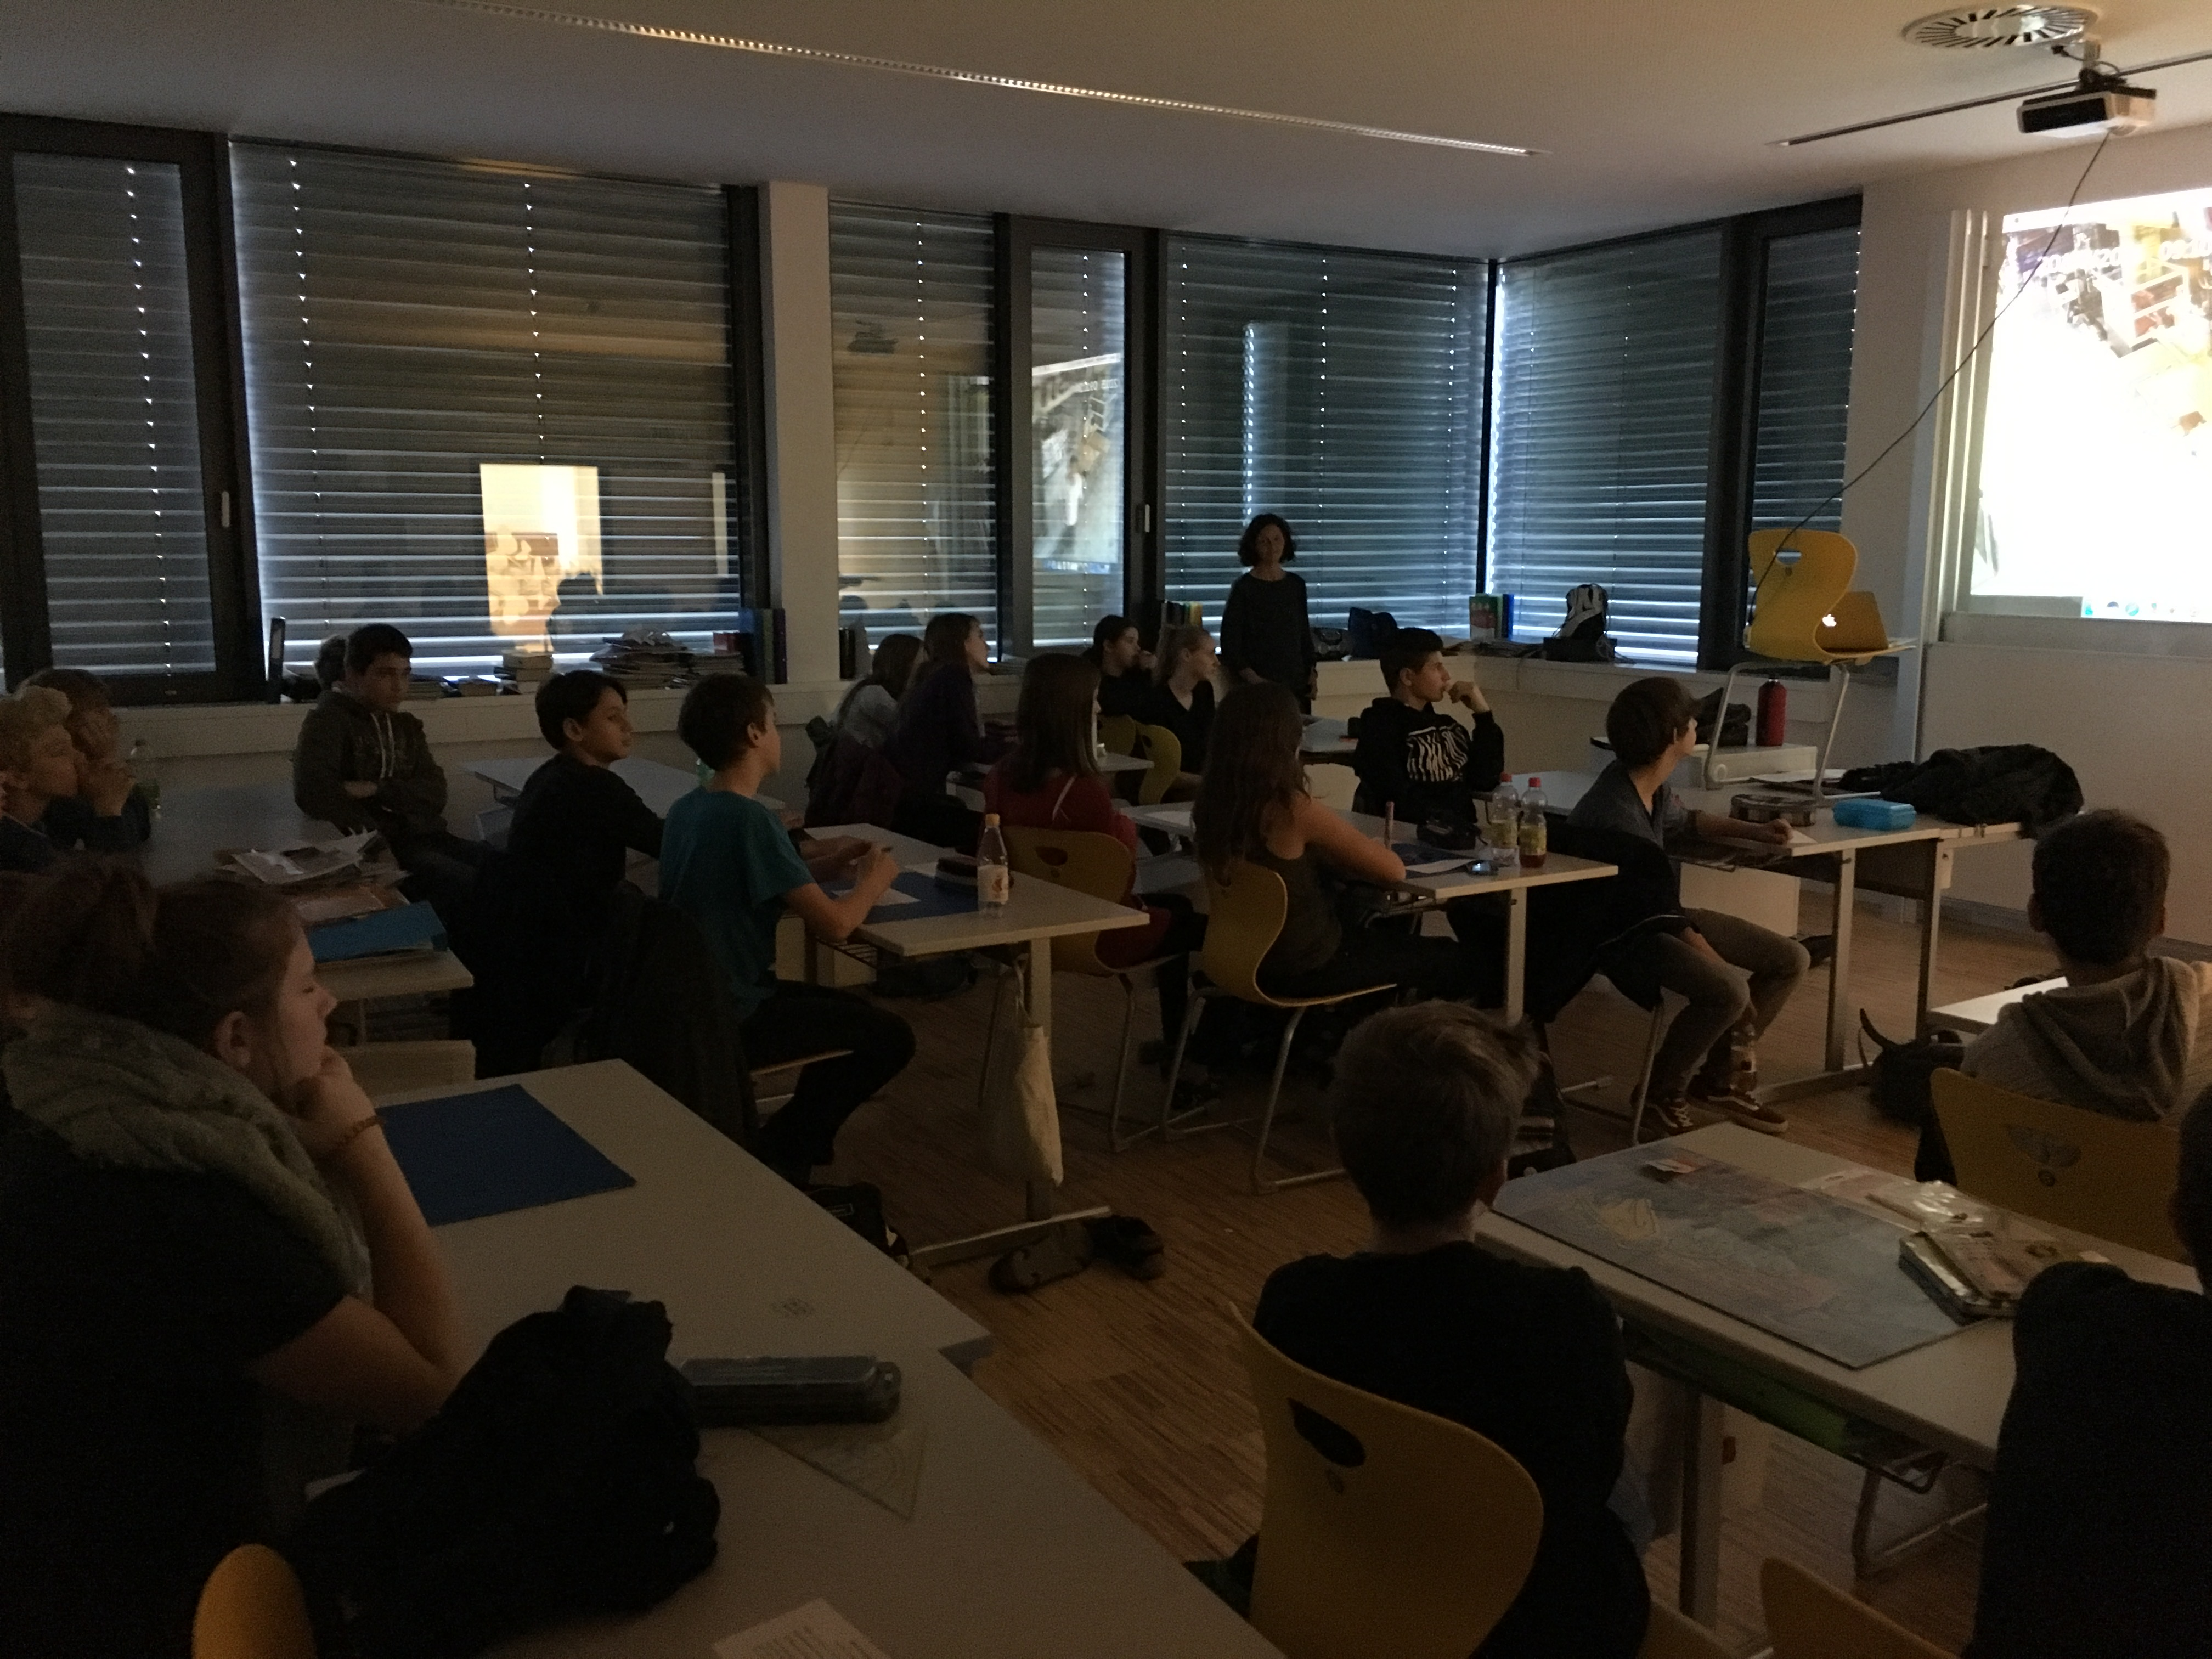 Gro-enzersdorf partnersuche 50 plus - Kirchberg am wagram